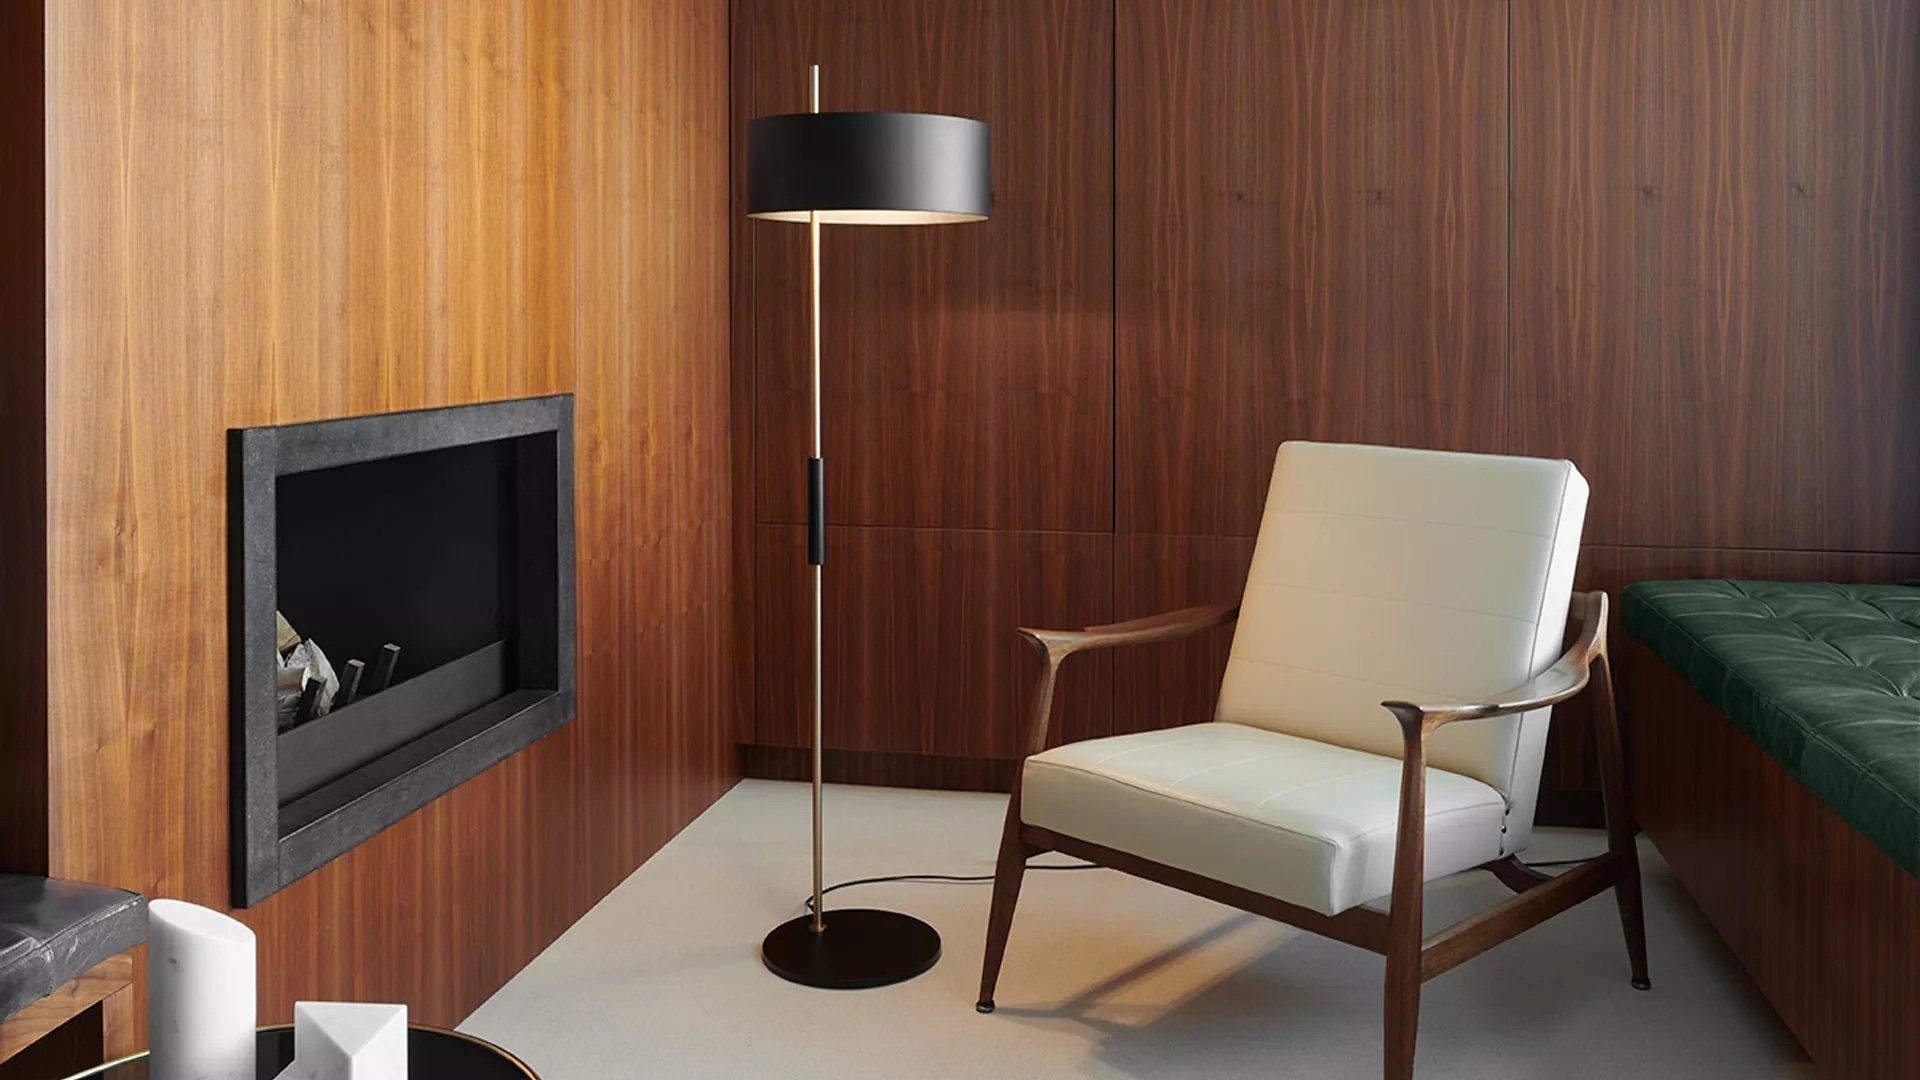 1953 Floor Lamp lighting from Oluce, designed by Ostuni & Forti